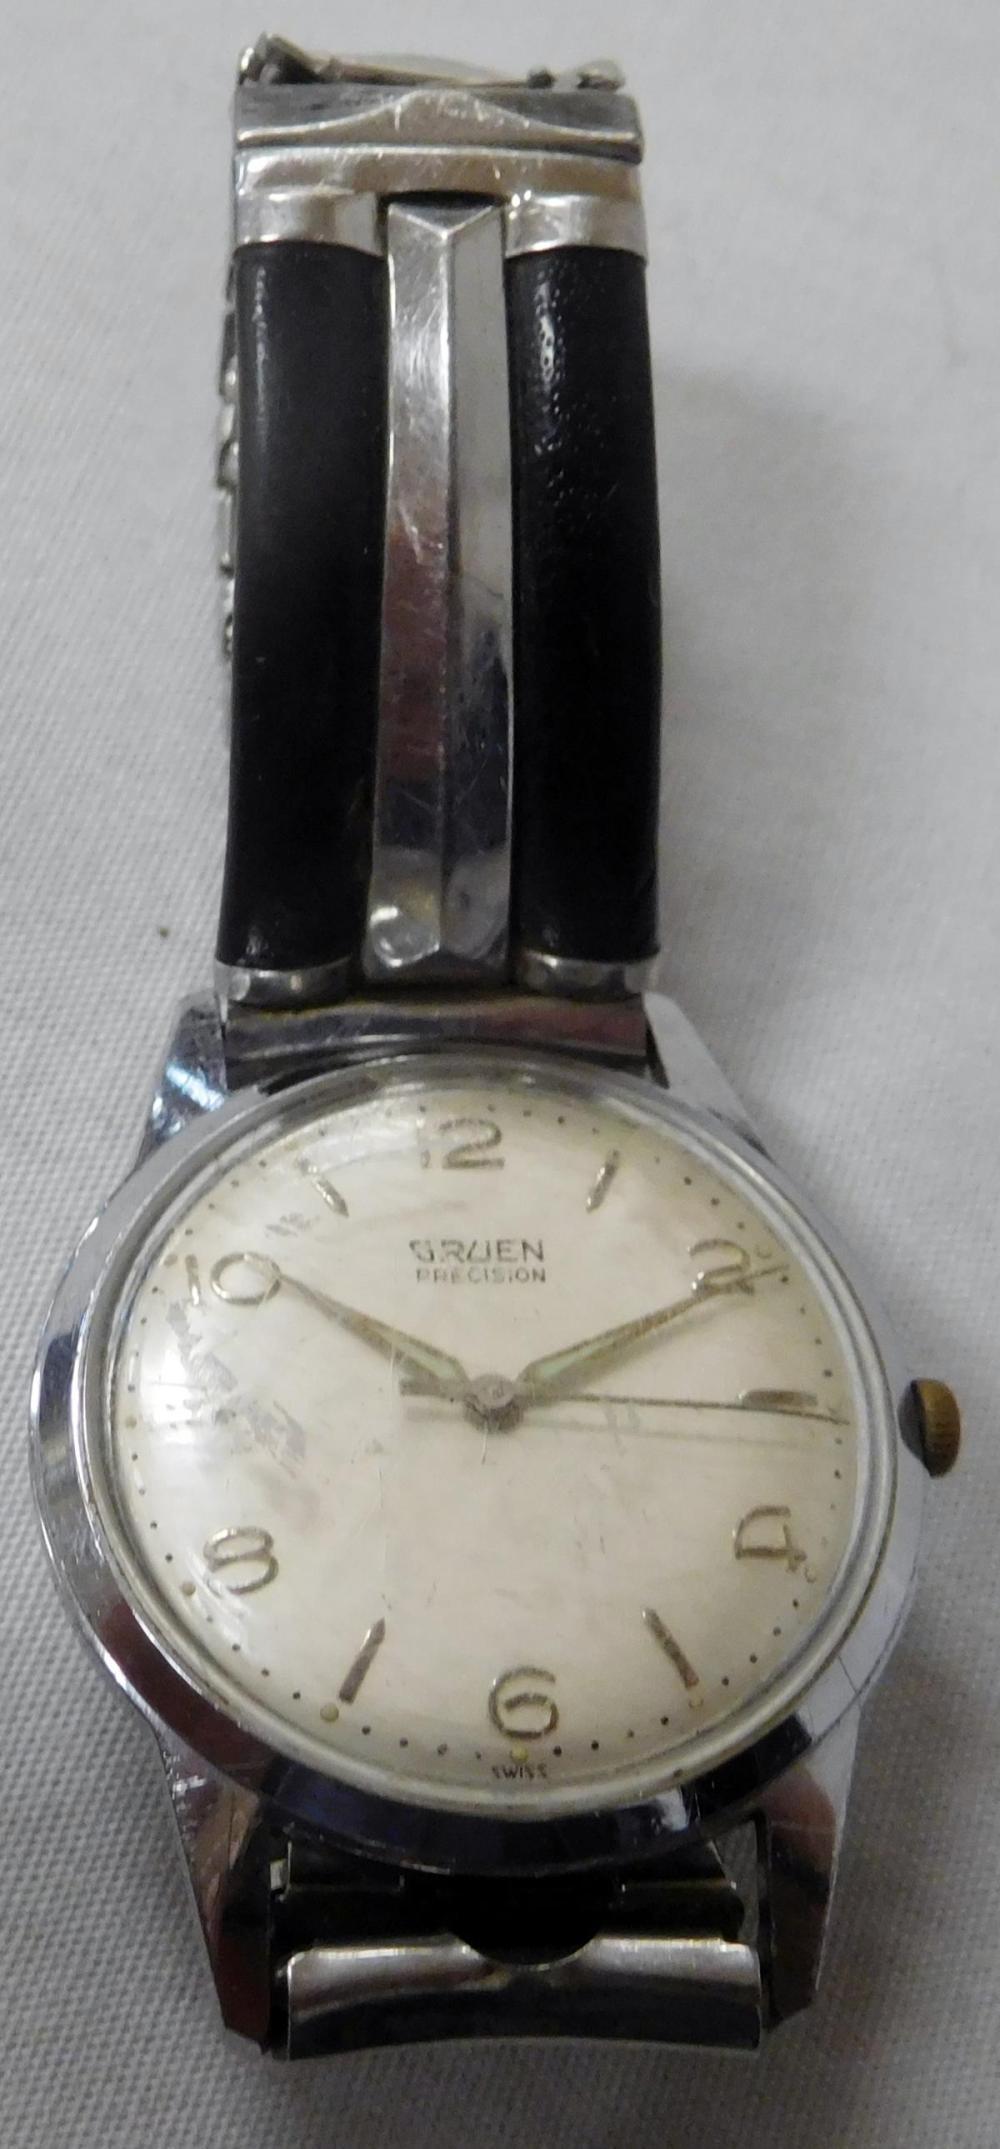 Vintage Gruen Precision Men's Wristwatch RUNS